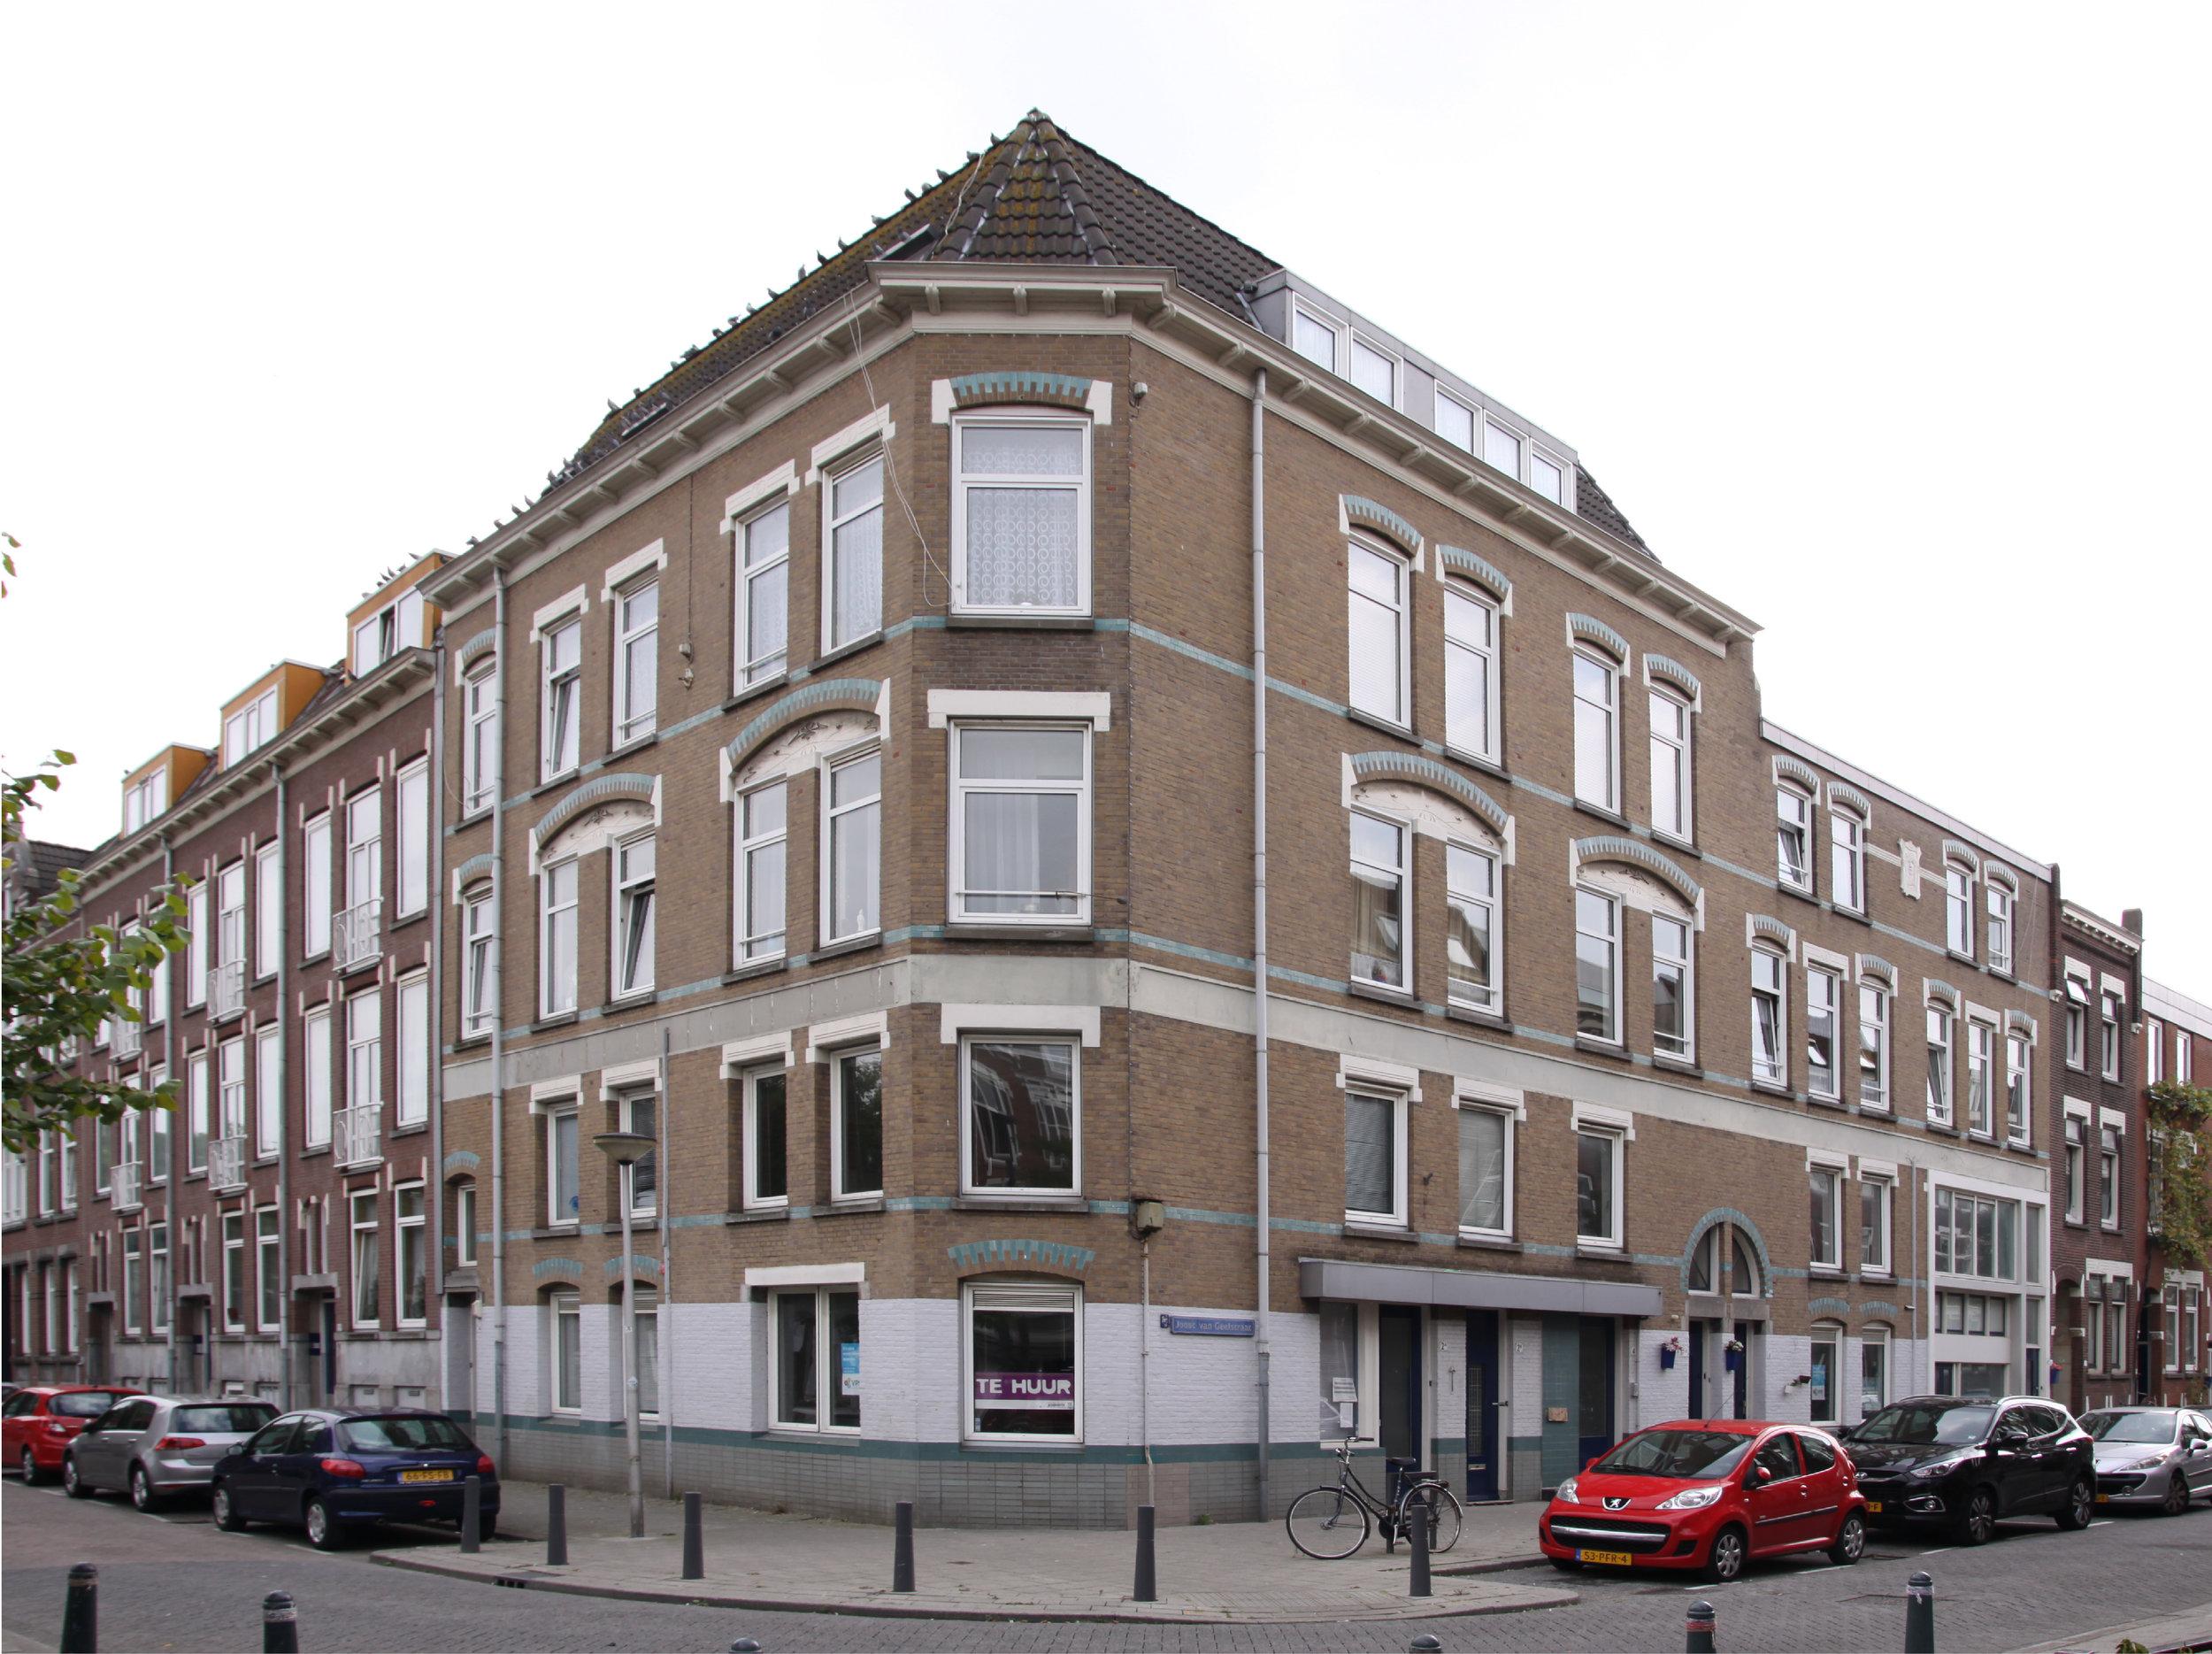 Personal-Architecture-rotterdam-wam-14.jpg